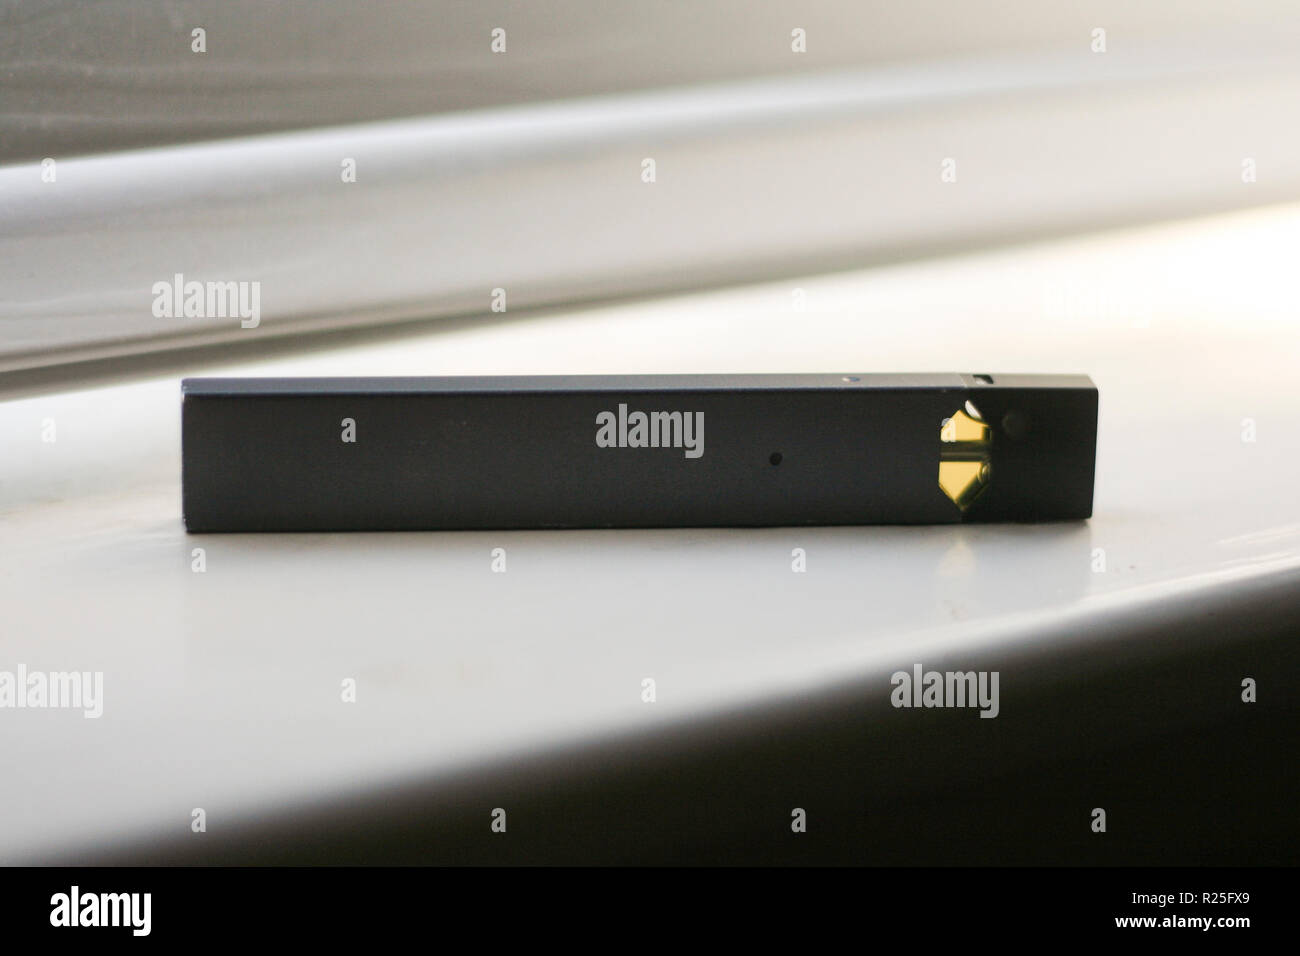 JUUL E-Cigarette and Flavor Pods on white background Stock Photo